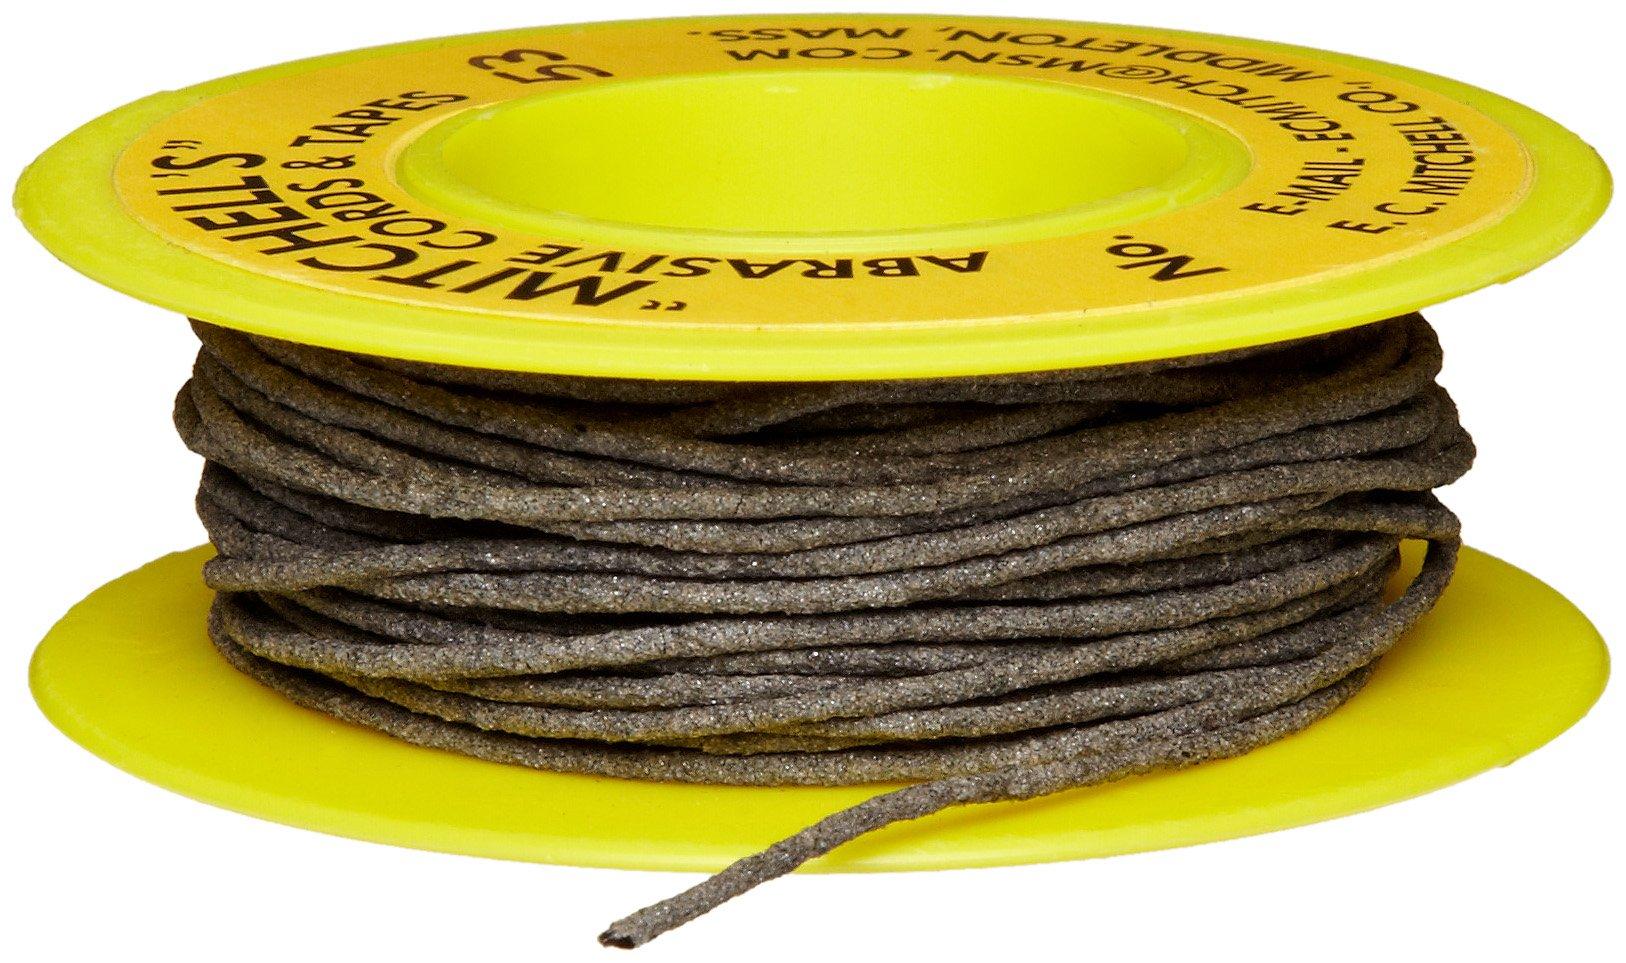 Mitchell Abrasives 53 Round Abrasive Cord, Aluminum Oxide 180 Grit .040'' Diameter x 50 Feet by Mitchell Abrasives